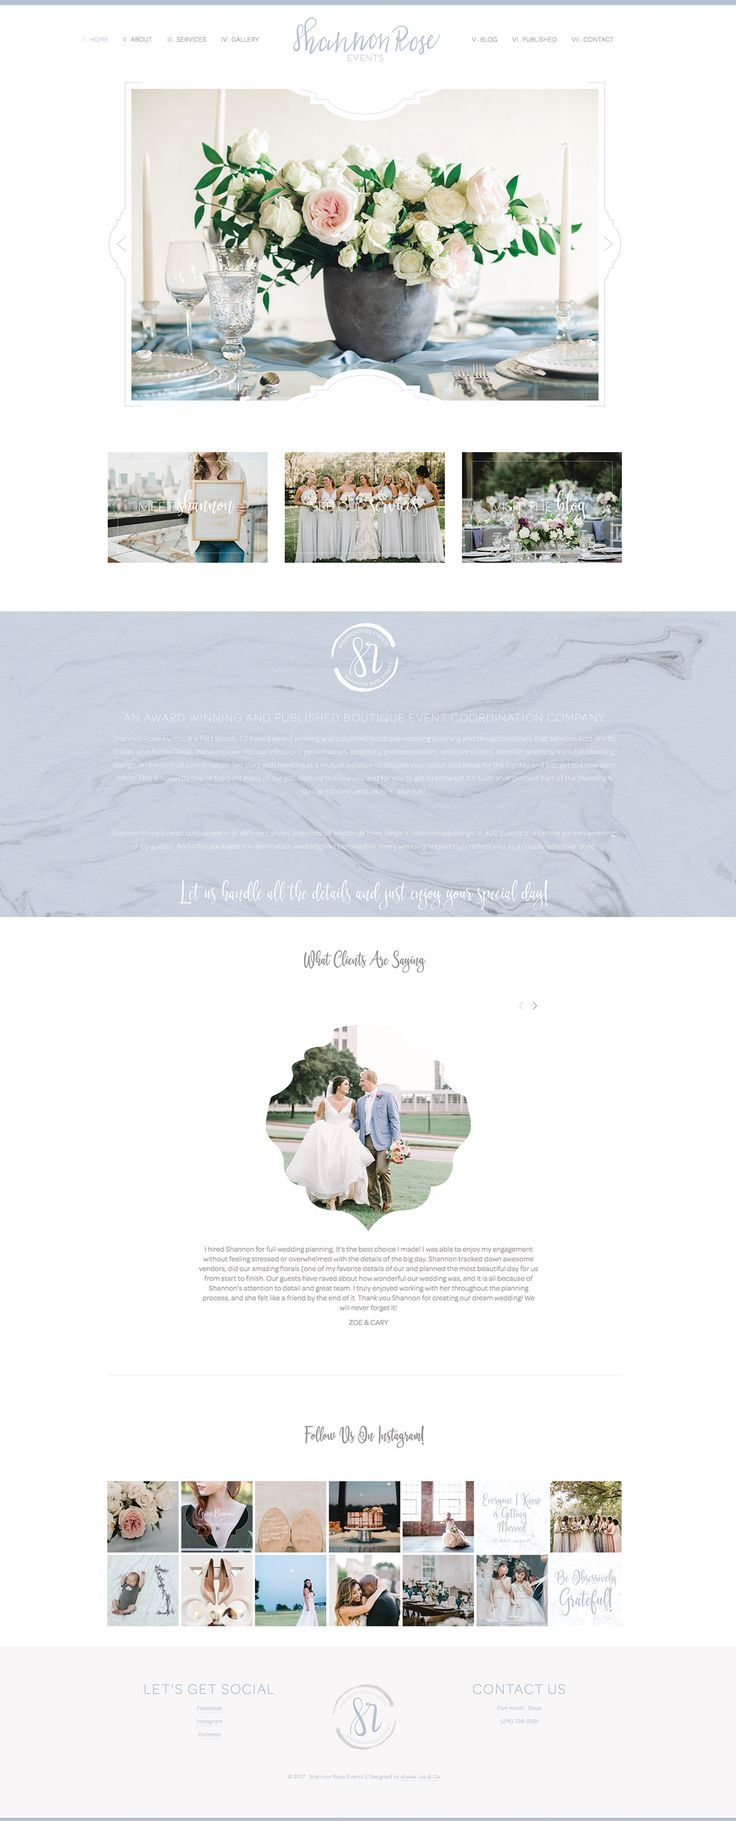 Alyssa Joy Co Squarespace Web Design Shannon Rose Events Fort Worth Boutique Wedding Squarespace Web Design Web Development Design Web Design Company